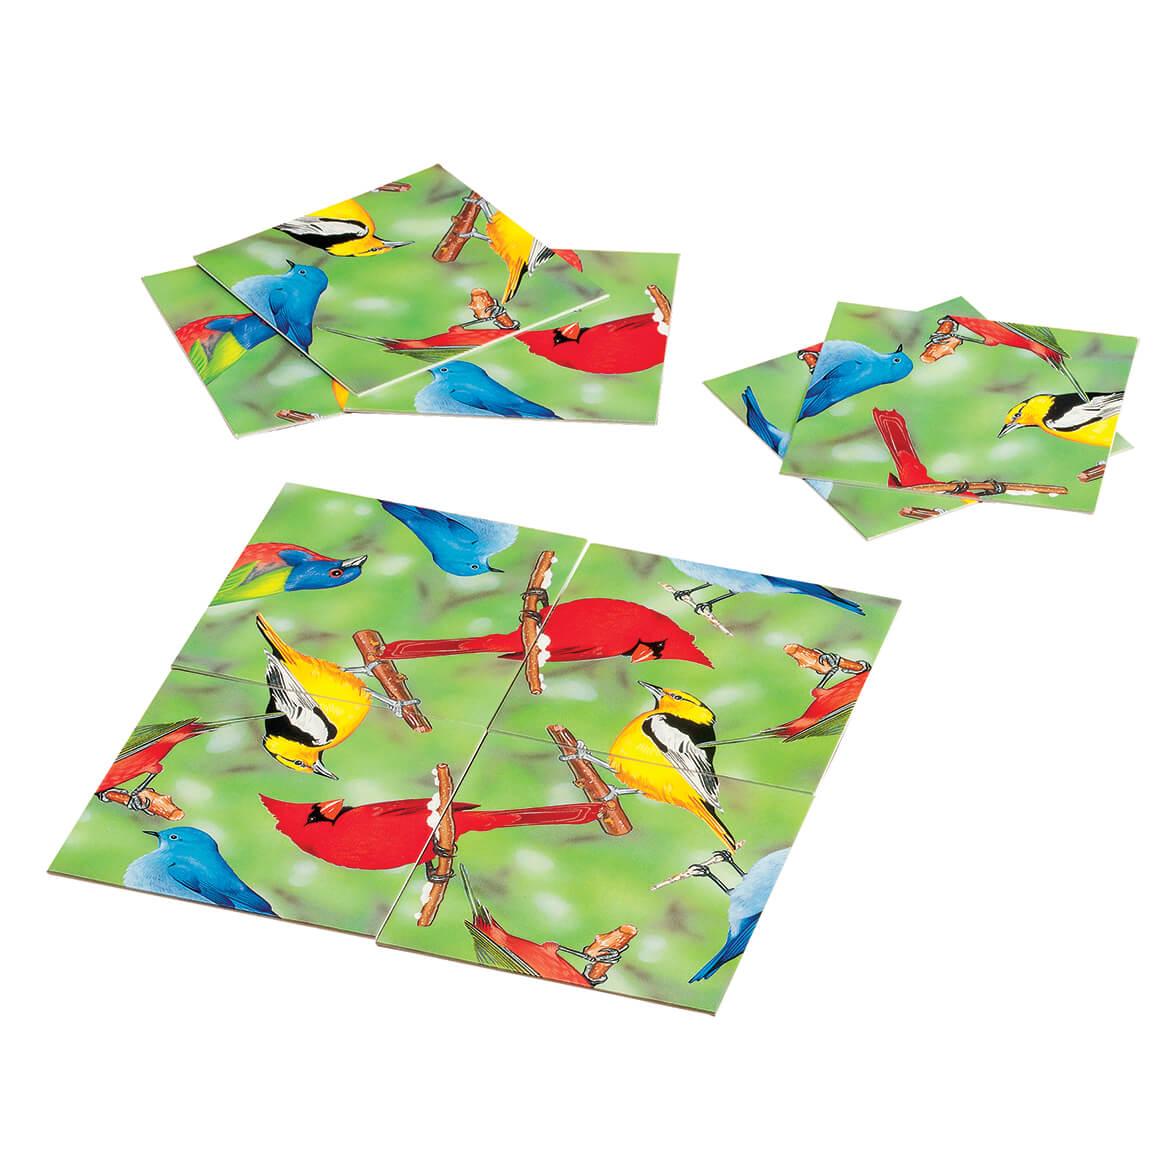 Scramble Squares® Puzzle, North American Birds